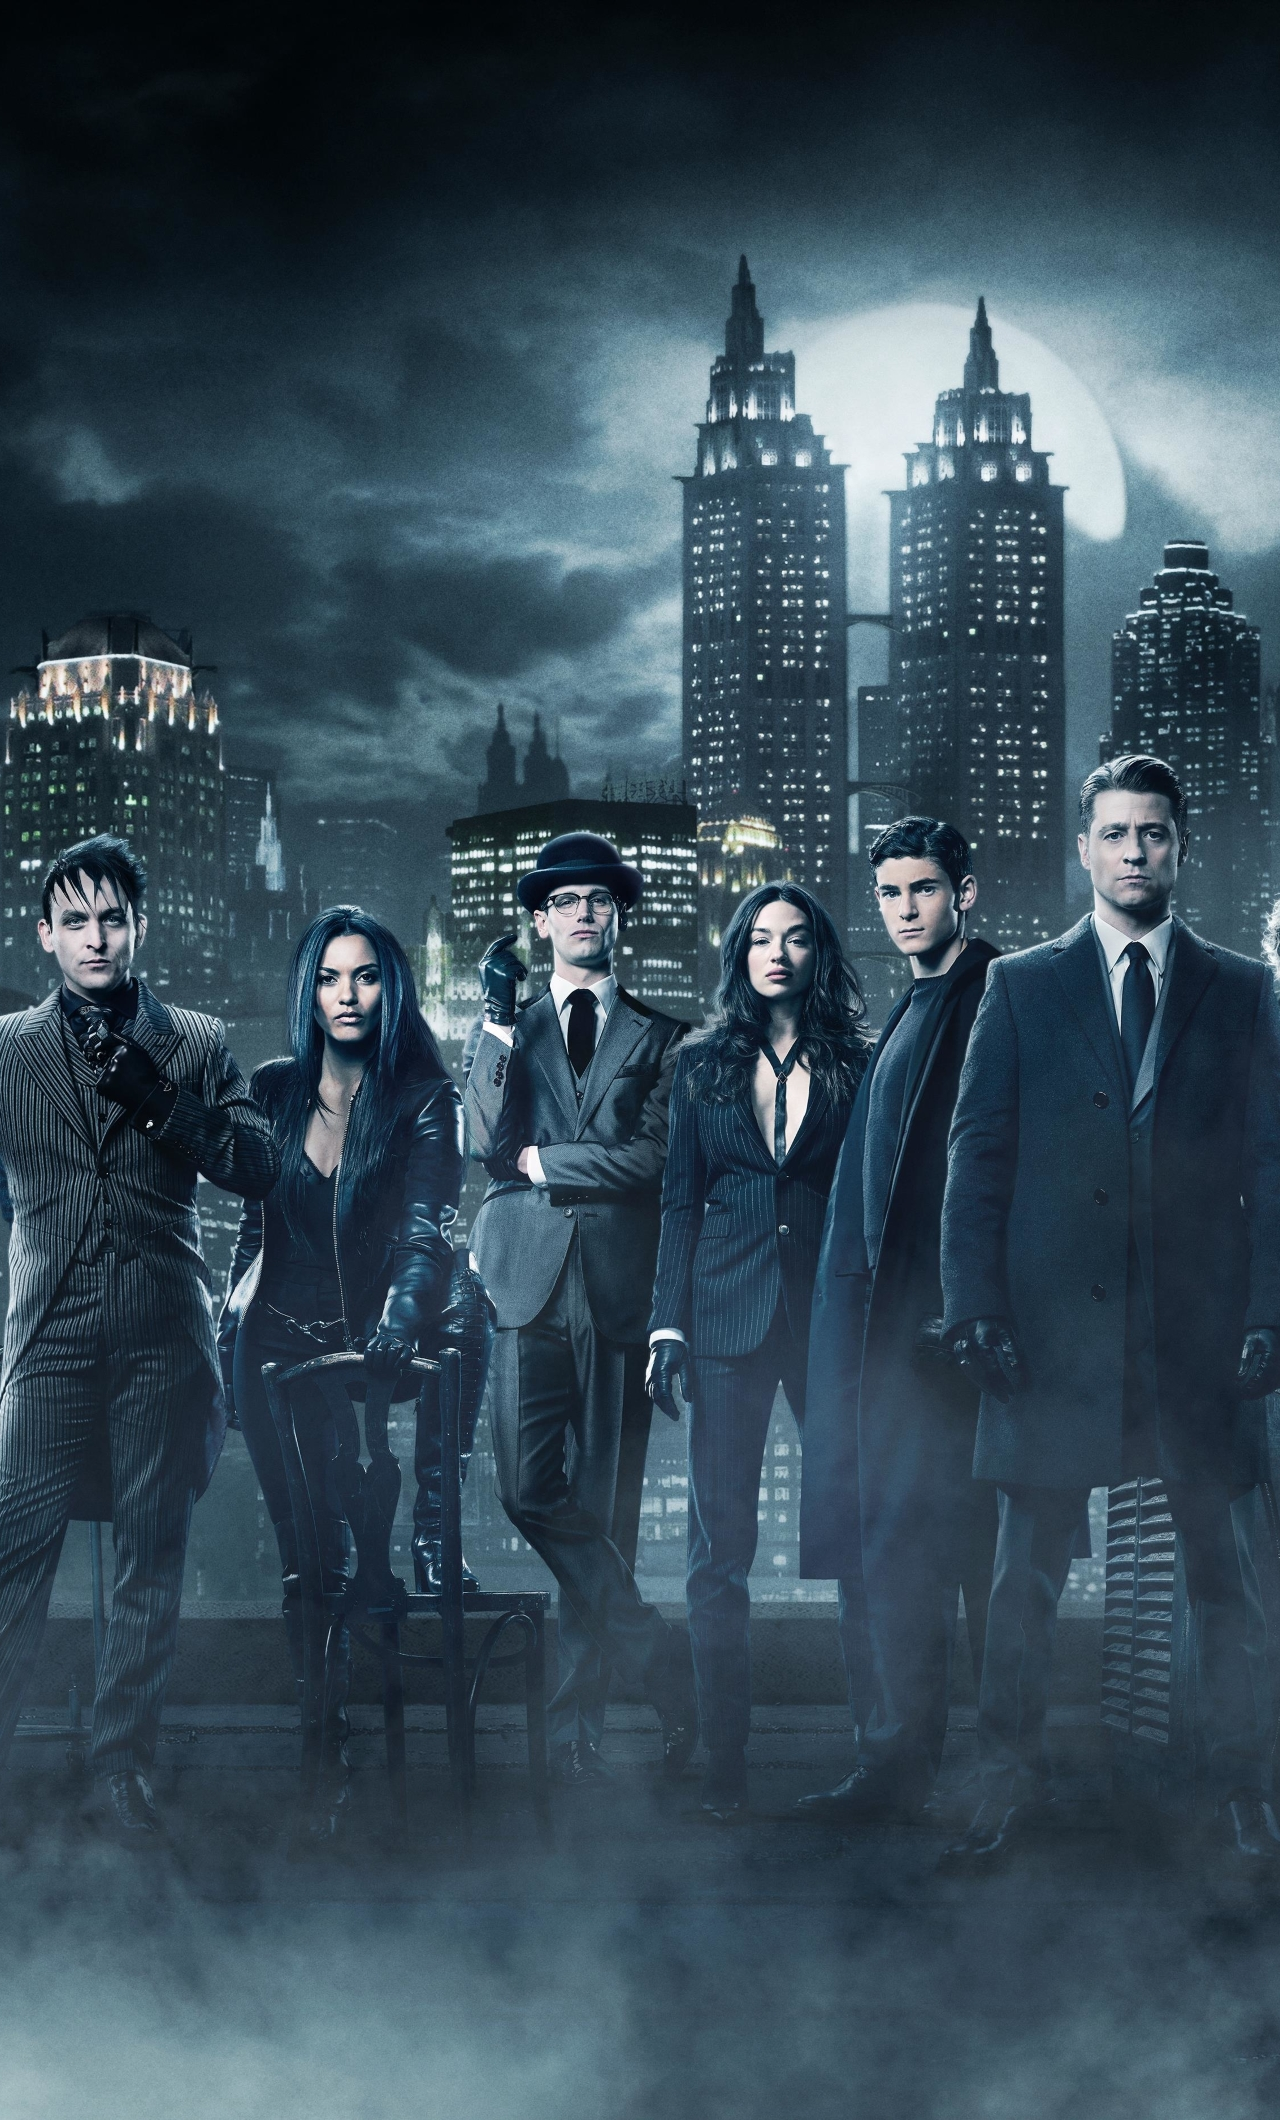 Gotham season 4 cast hd 4k wallpaper - Gotham wallpaper ...